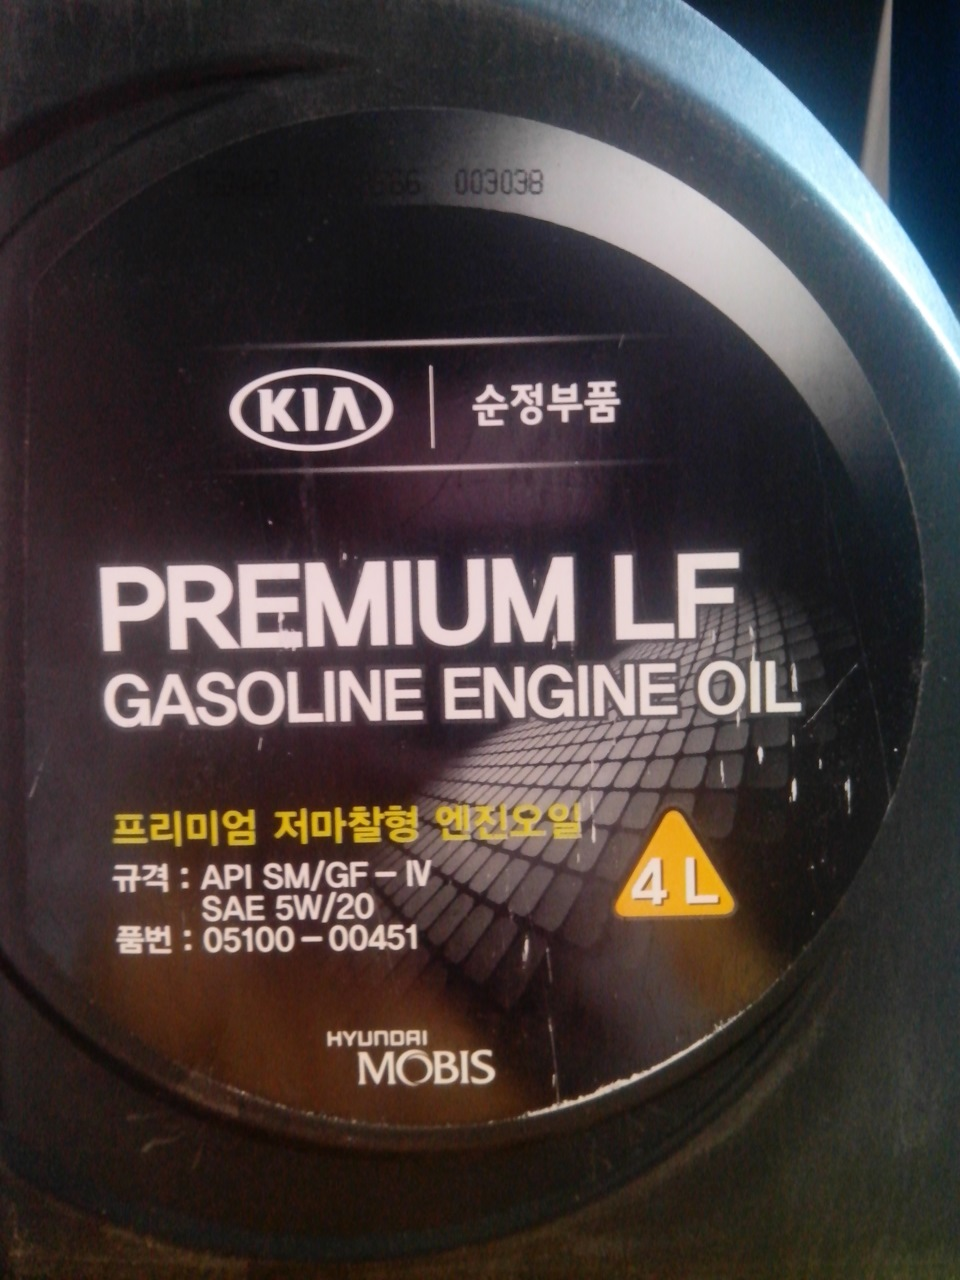 hyundai premium gasoline lf 5w-20 отзывы